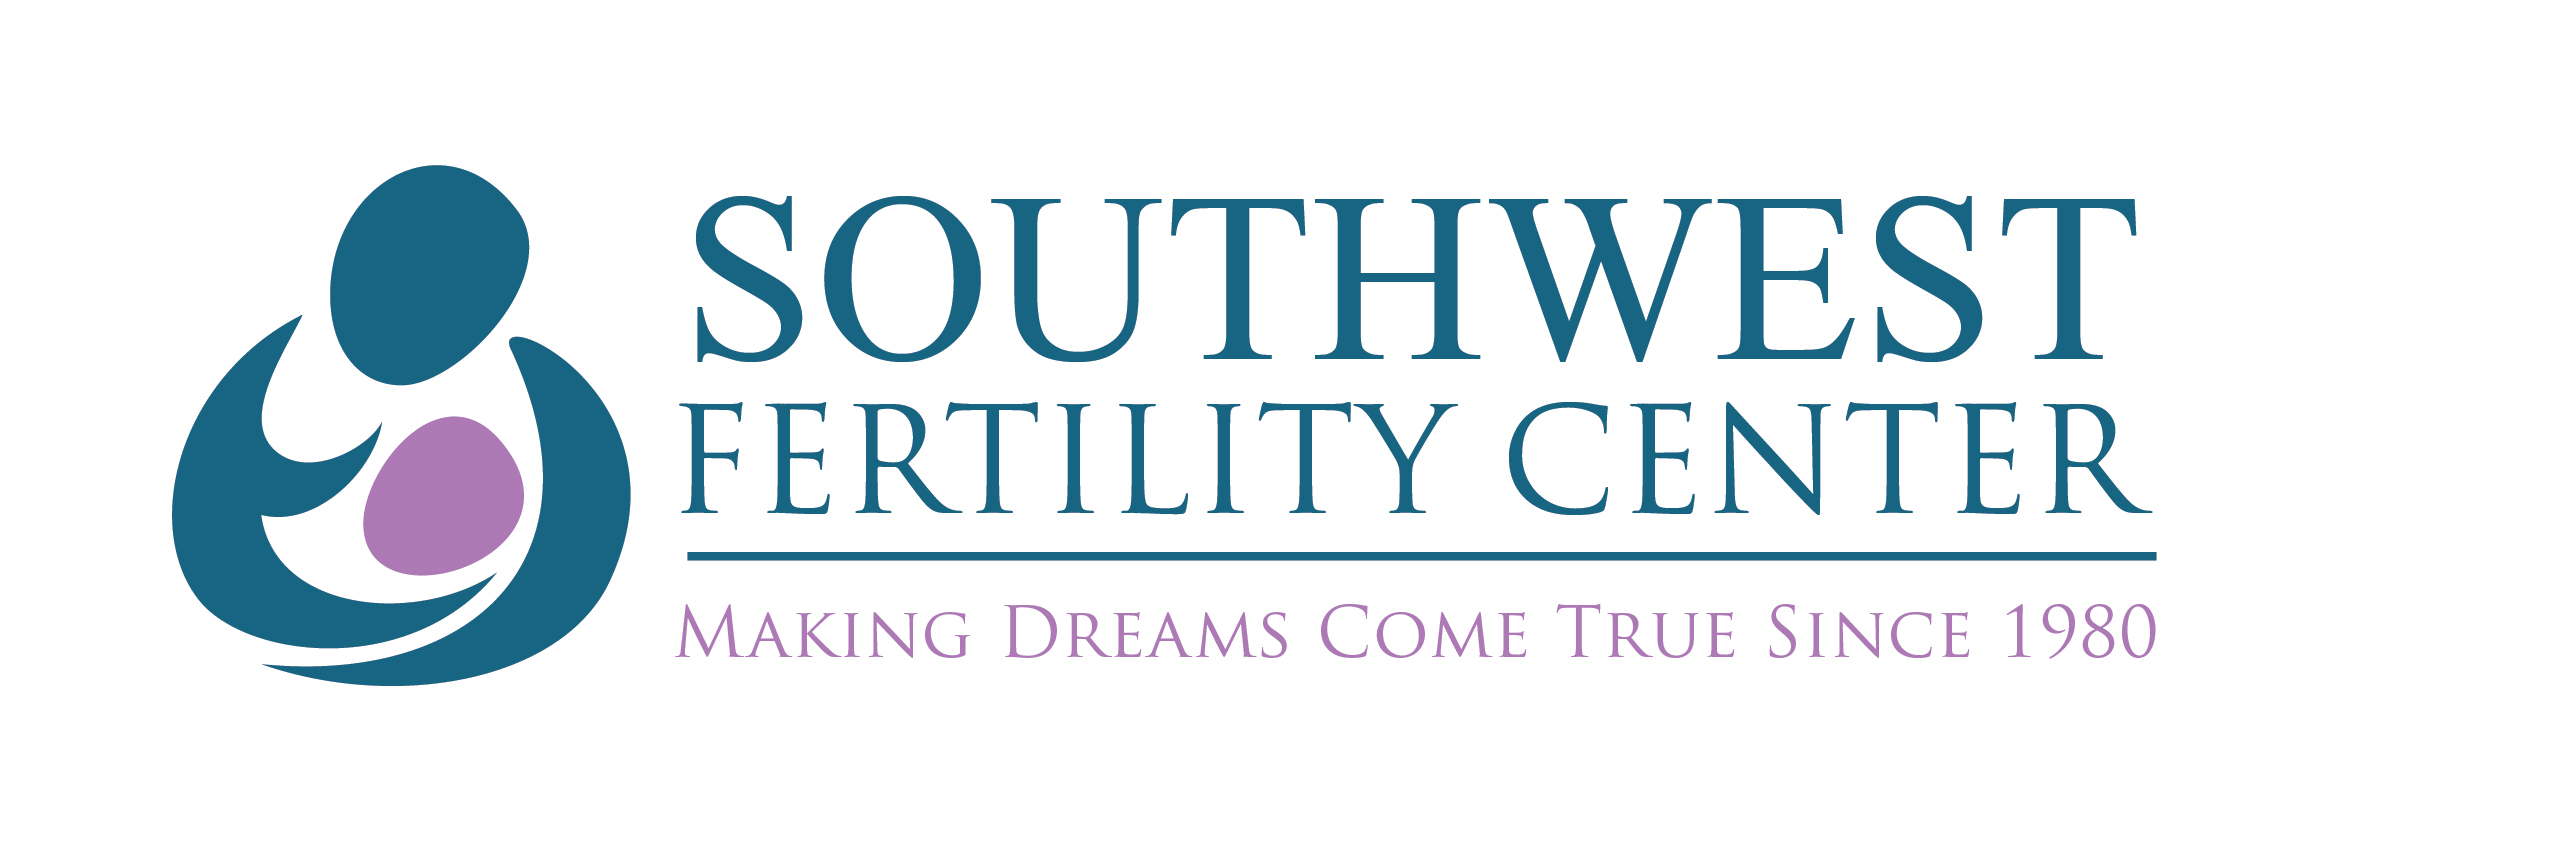 Southwest Fertility Center